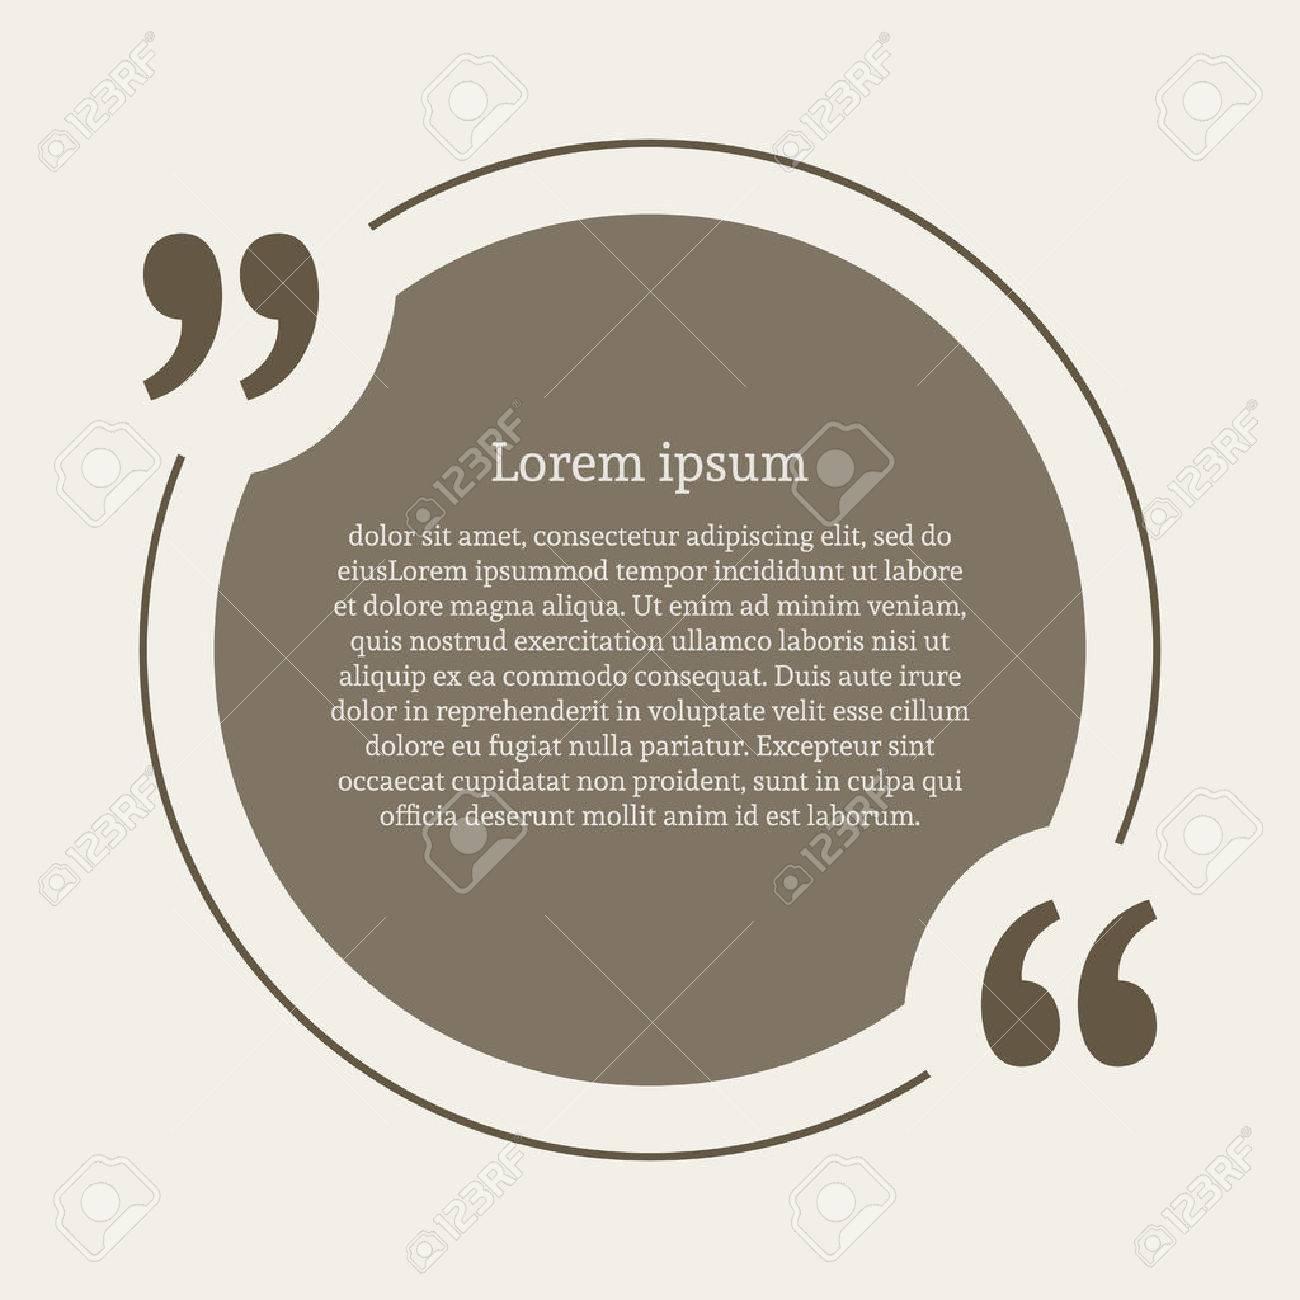 Quotation mark speech bubble. Empty quote blank citation template. Round design element for business card, paper sheet, information, note, message, motivation, comment etc. Vector illustration. - 54428809